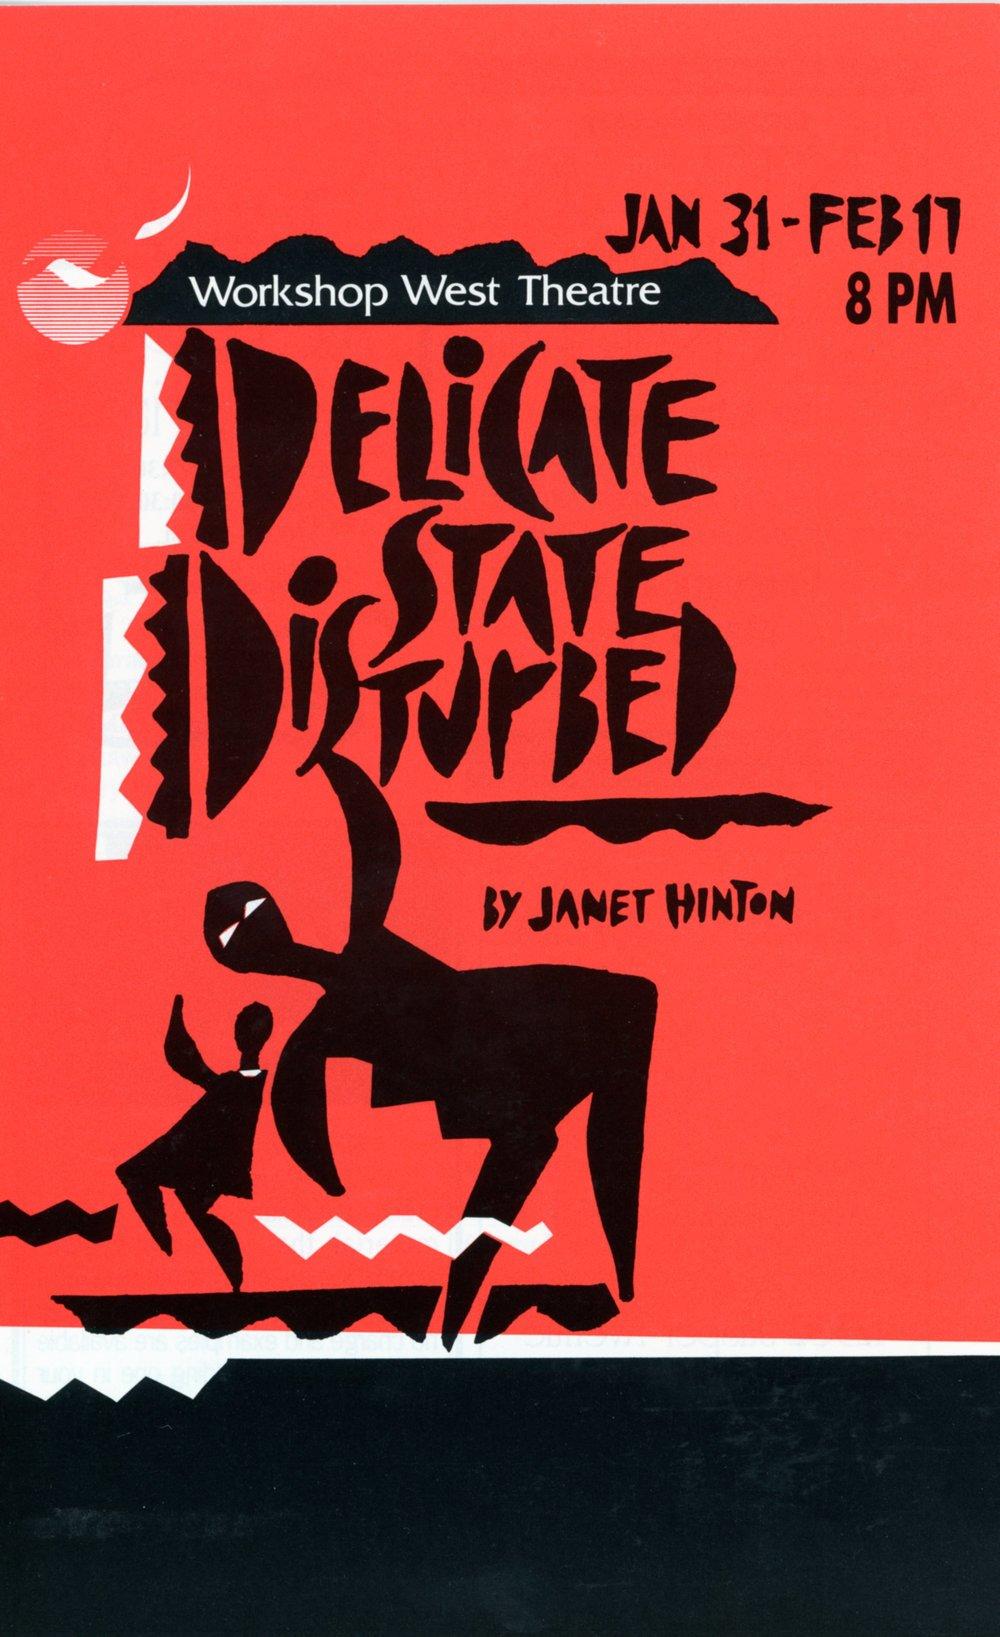 Delicate State Distrubed (January, 1991)-Program Cover JPEG.jpg